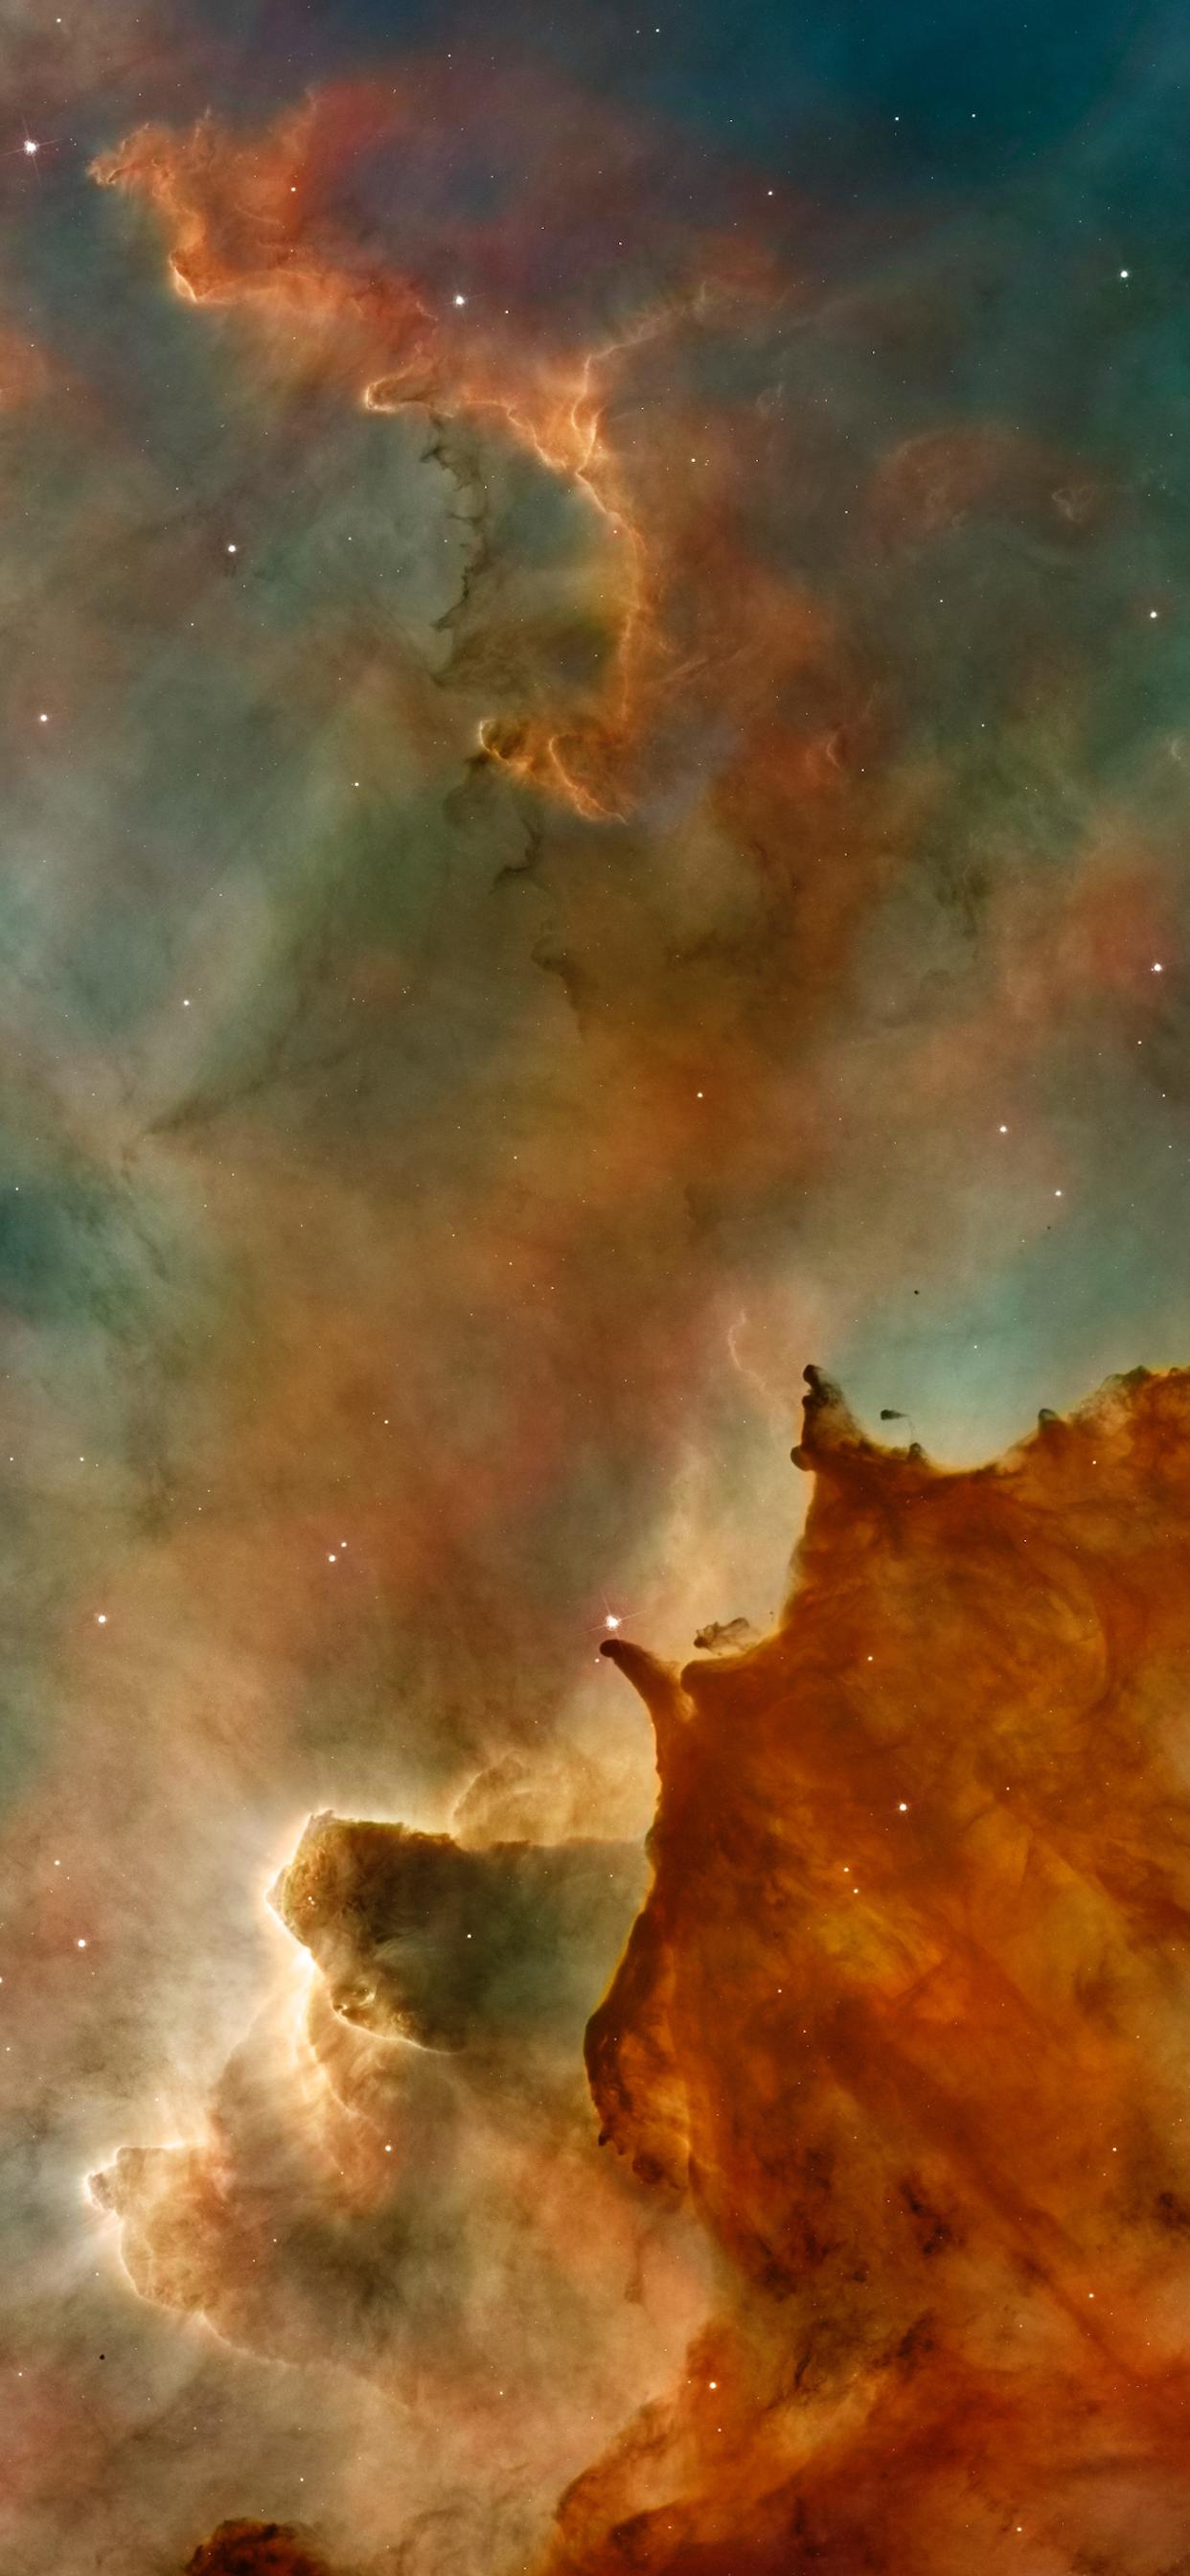 iPhone wallpapers space galaxy orange Fonds d'écran iPhone du 04/02/2020